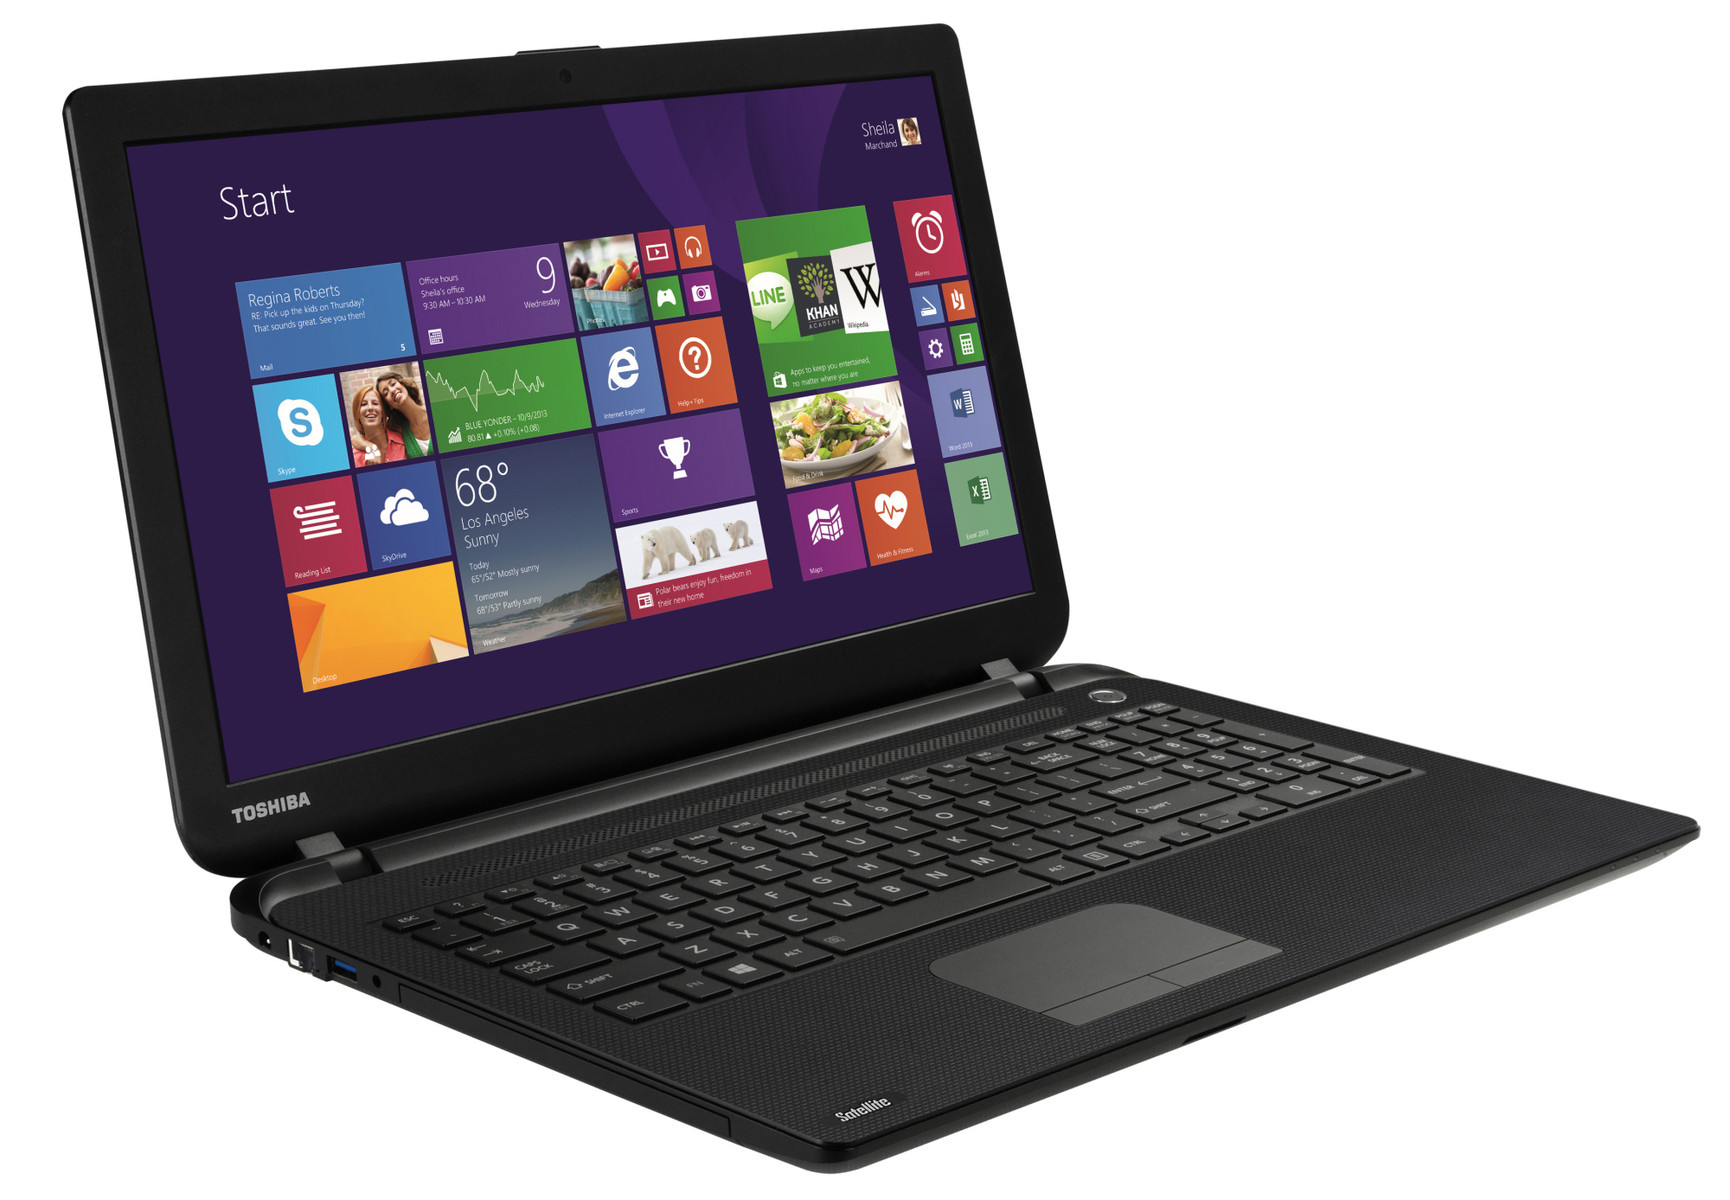 Toshiba Portege 4010 Notebook Wireless Hotkey Drivers for Windows Download